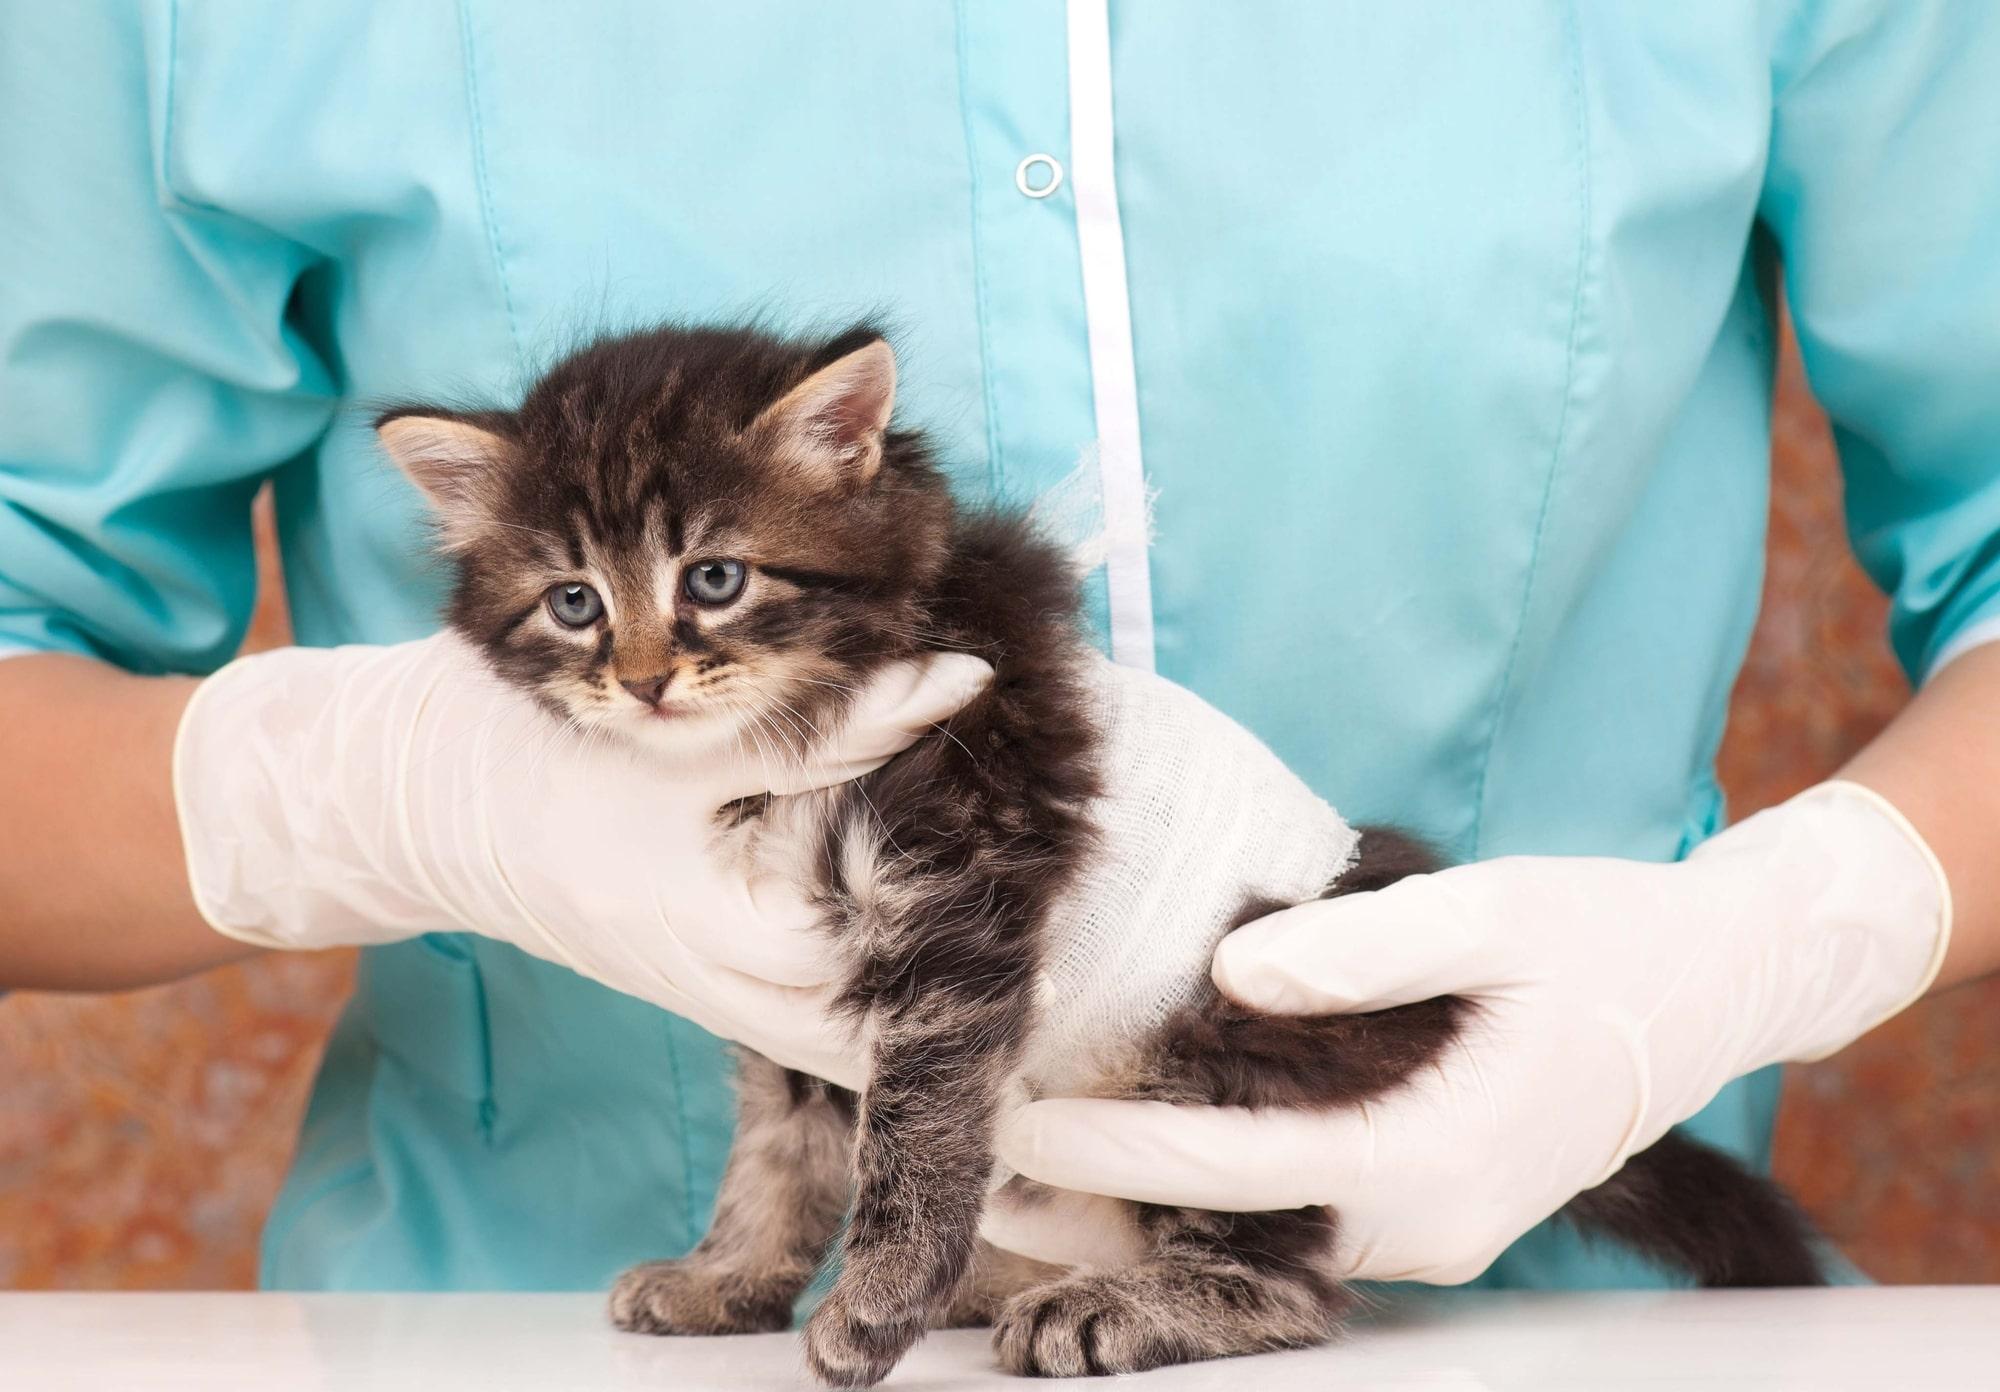 Pet Emergency Care - Cat Emergency